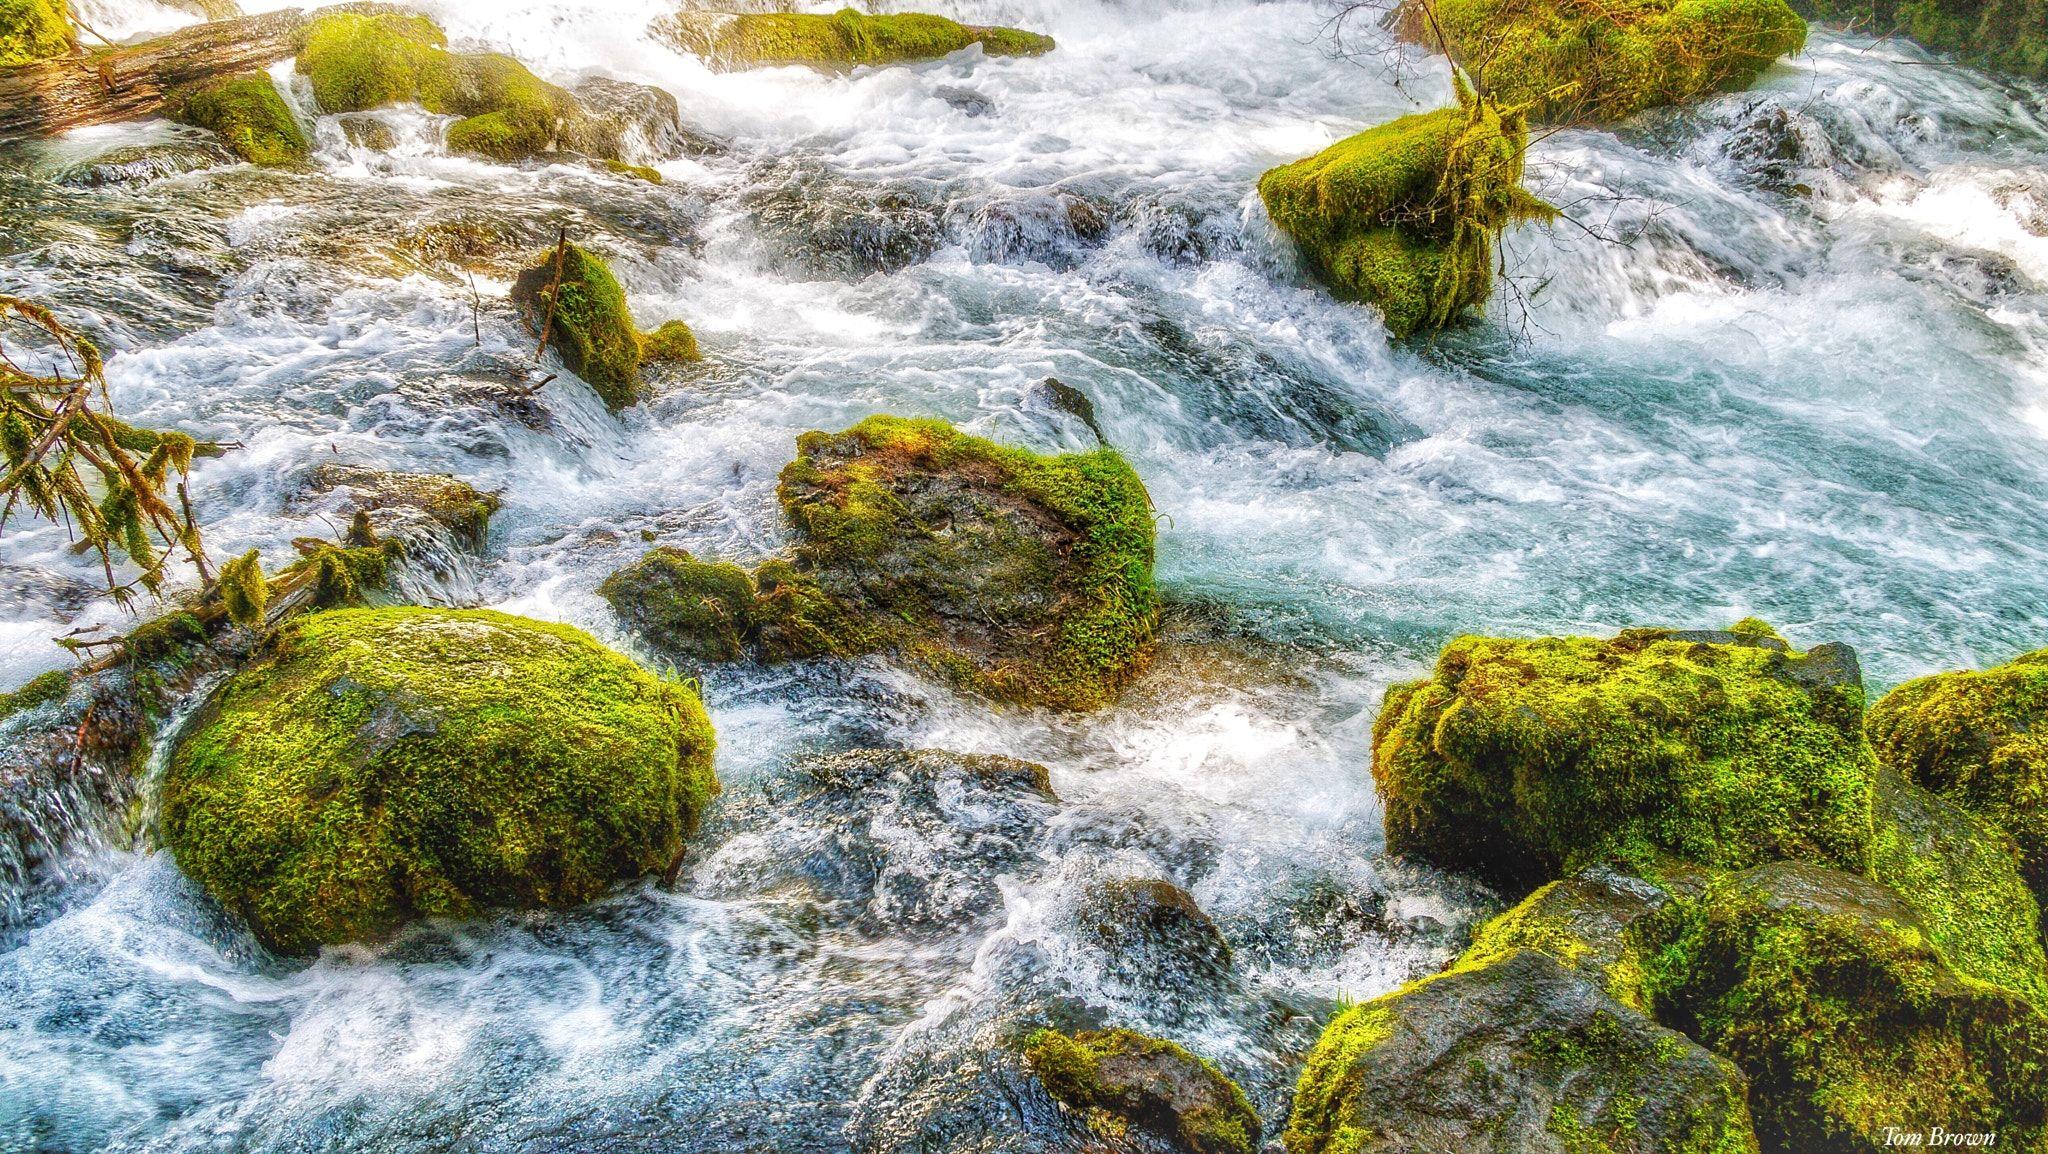 'Mossy Rocks In The Stream' -